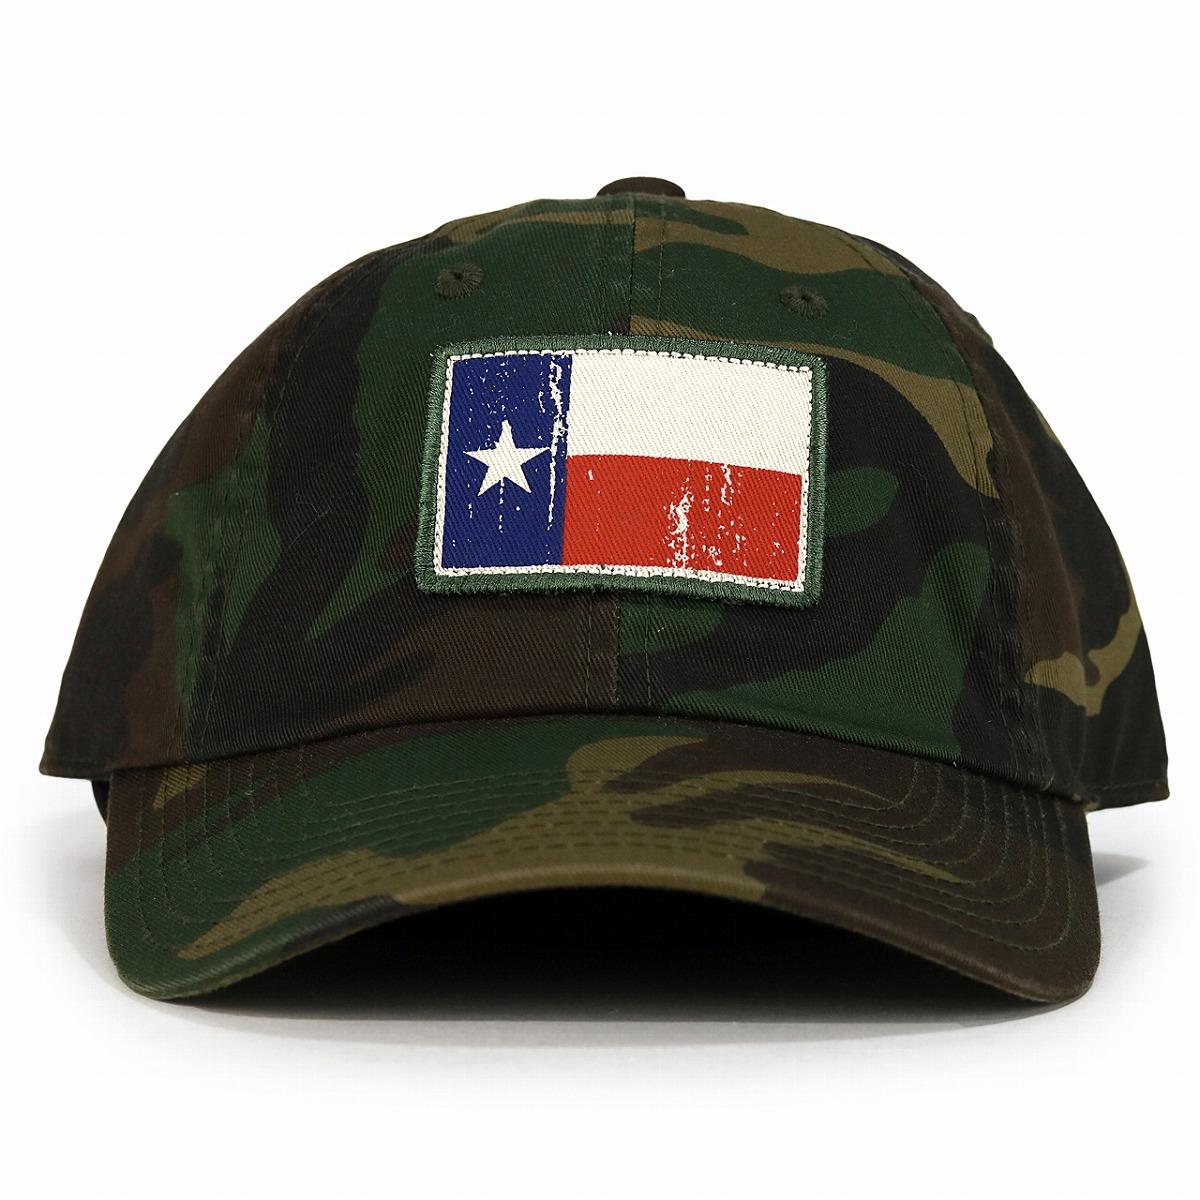 c1fd0772fc1cb ... closeout cap oar season camouflage american needle ladys baseball cap  camouflage pattern men hat state flag